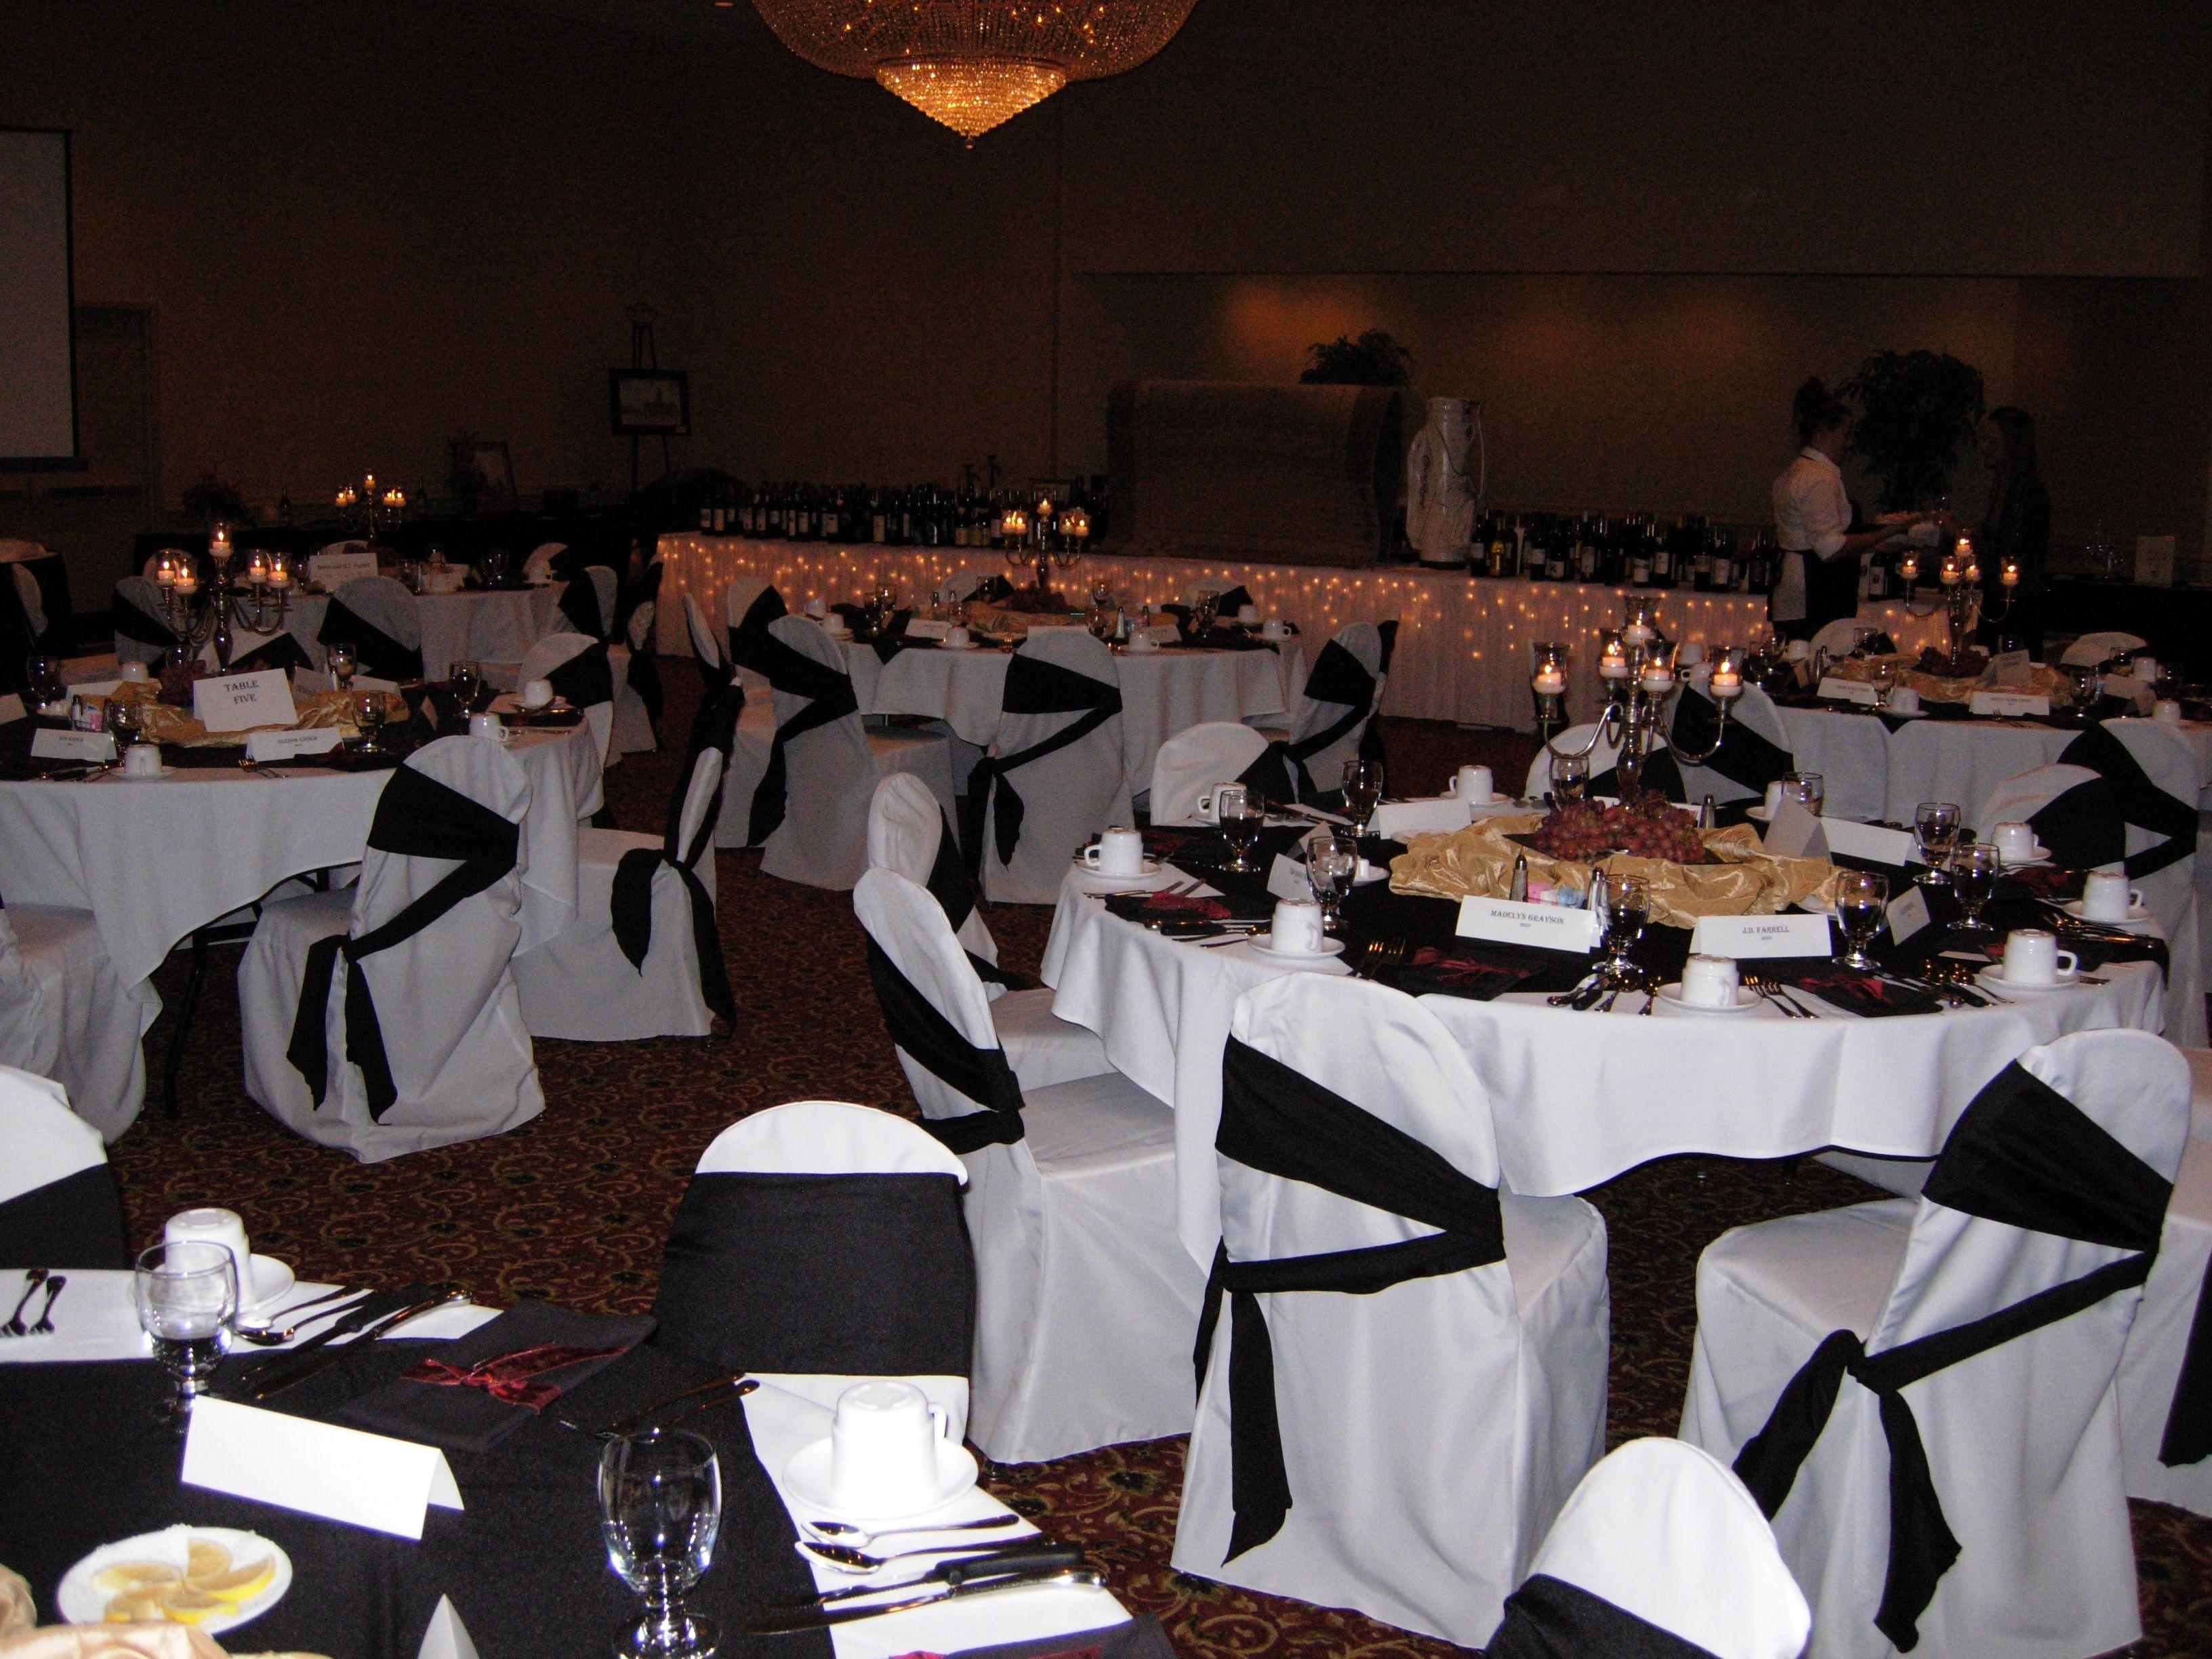 Evansville Hotels with Restaurants: Wedding Facility Evansville Indiana_Clarion Inn Hotel. Clarion Inn  4101 Hwy 41 N  Evansville IN 47711  United States  (812) 424-6400  http://www.clarionevansville.com